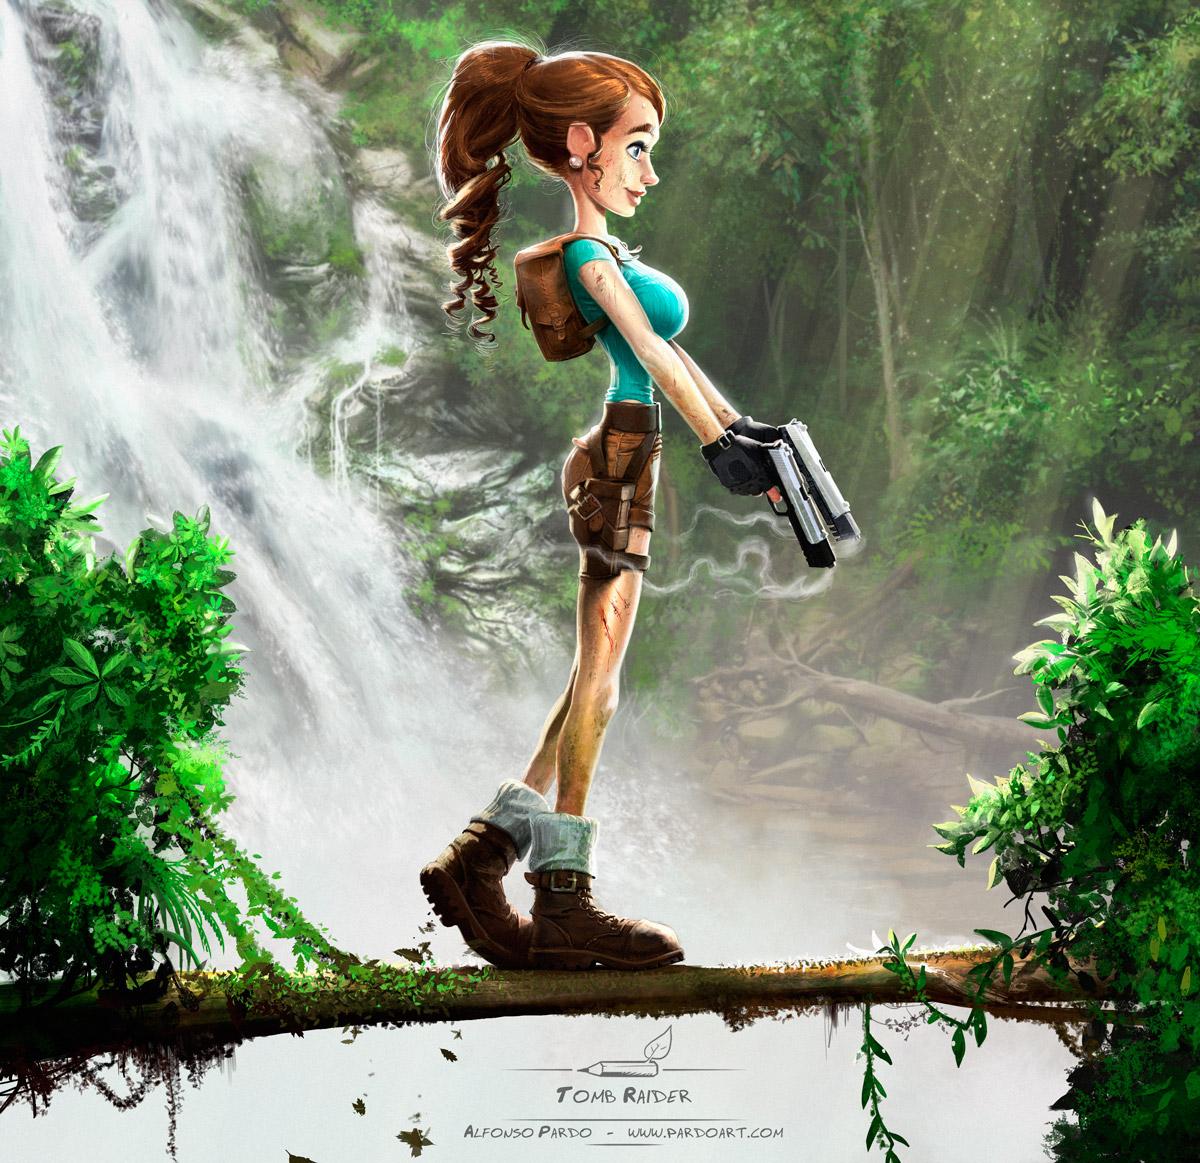 Tomb Raider crossed with Disney